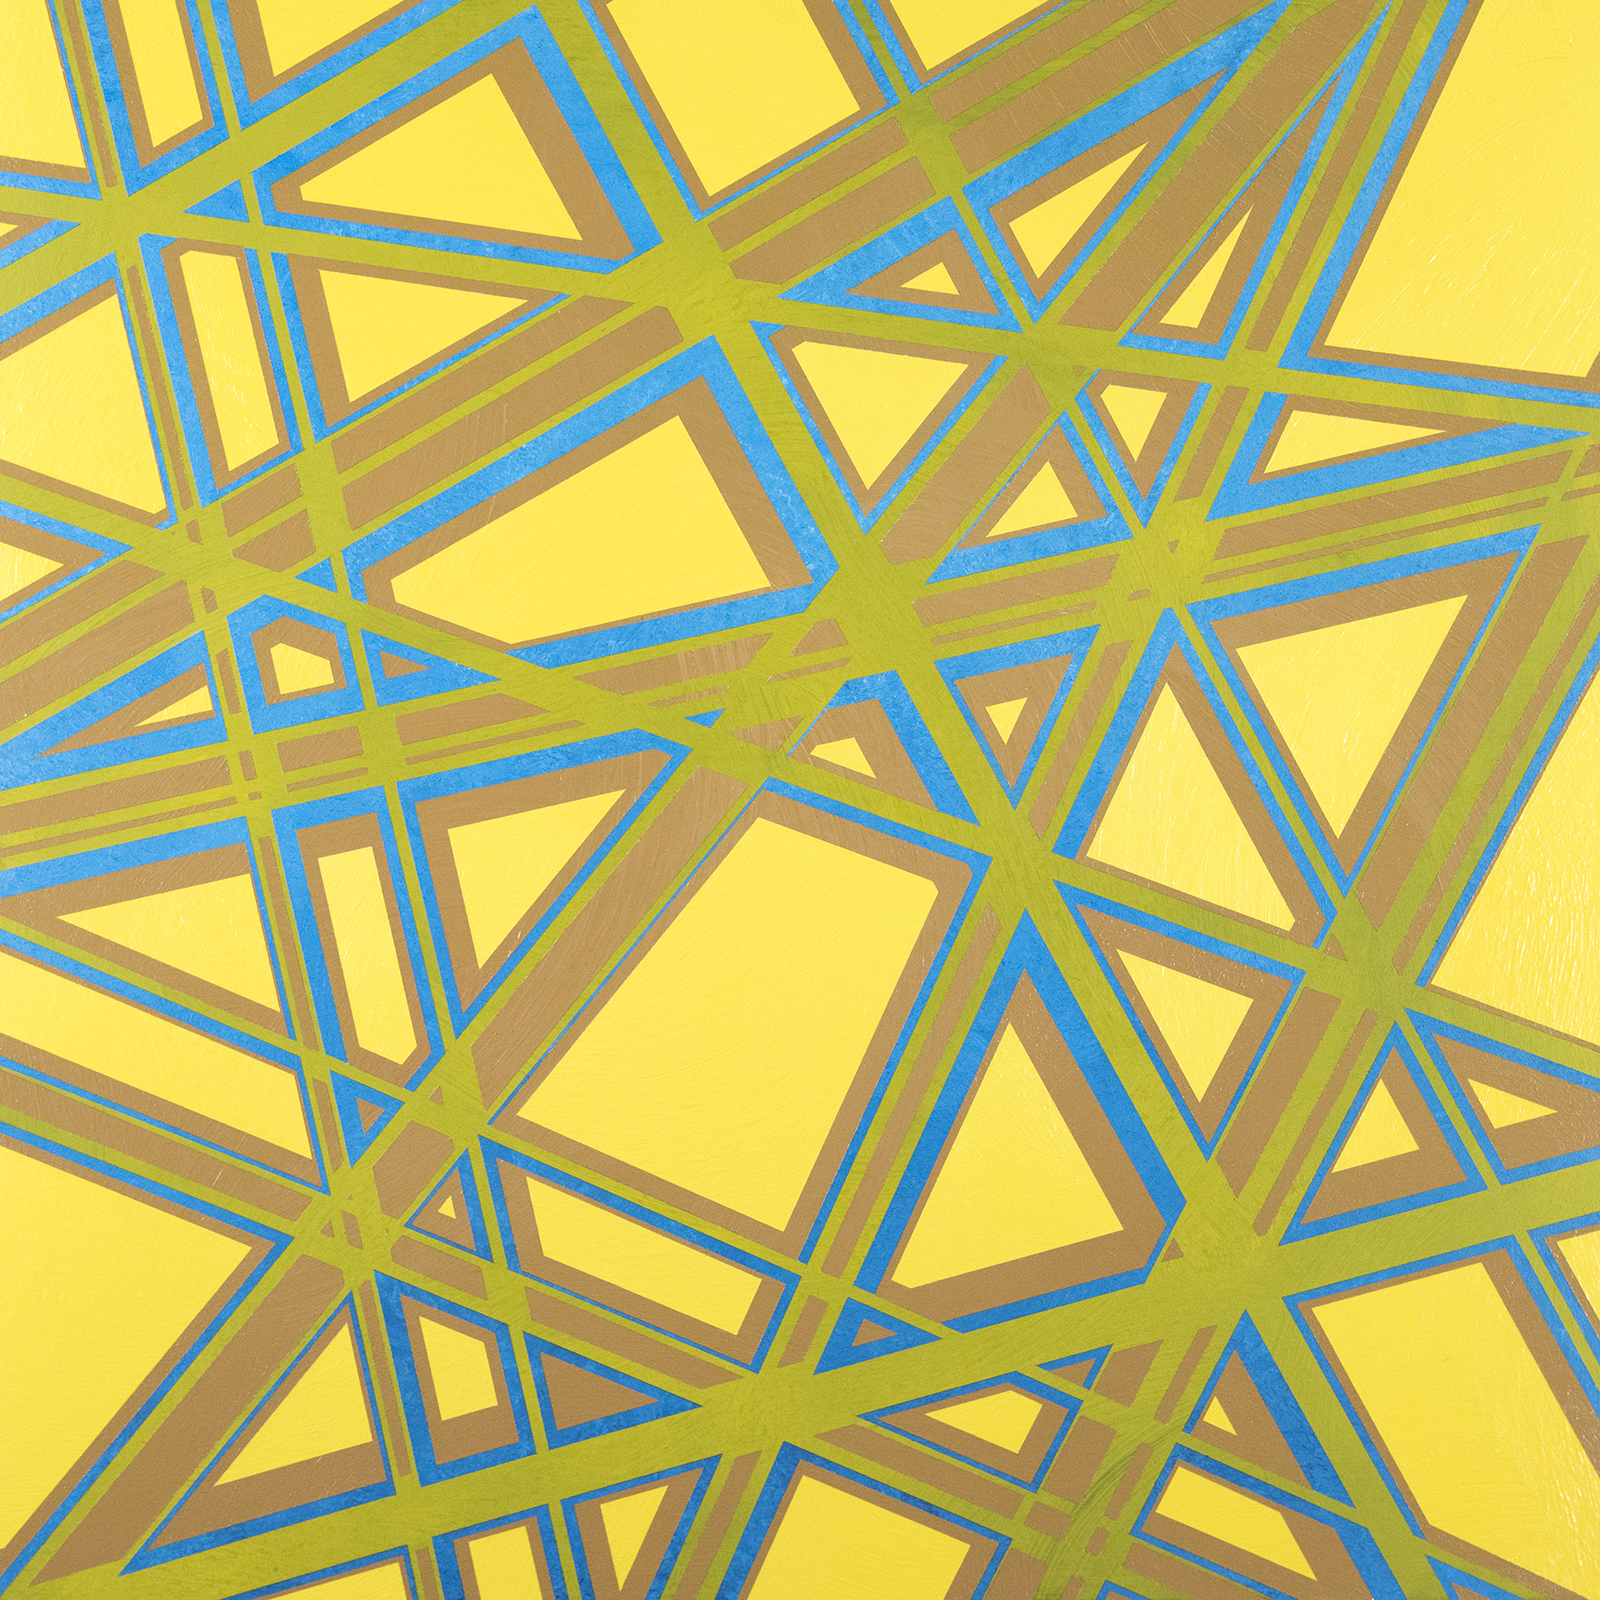 Daniel_Stuelpnagel-_Inside_The_Brightest_Island_-30x30_-acryliconwoodpanel-2018-$900.jpg